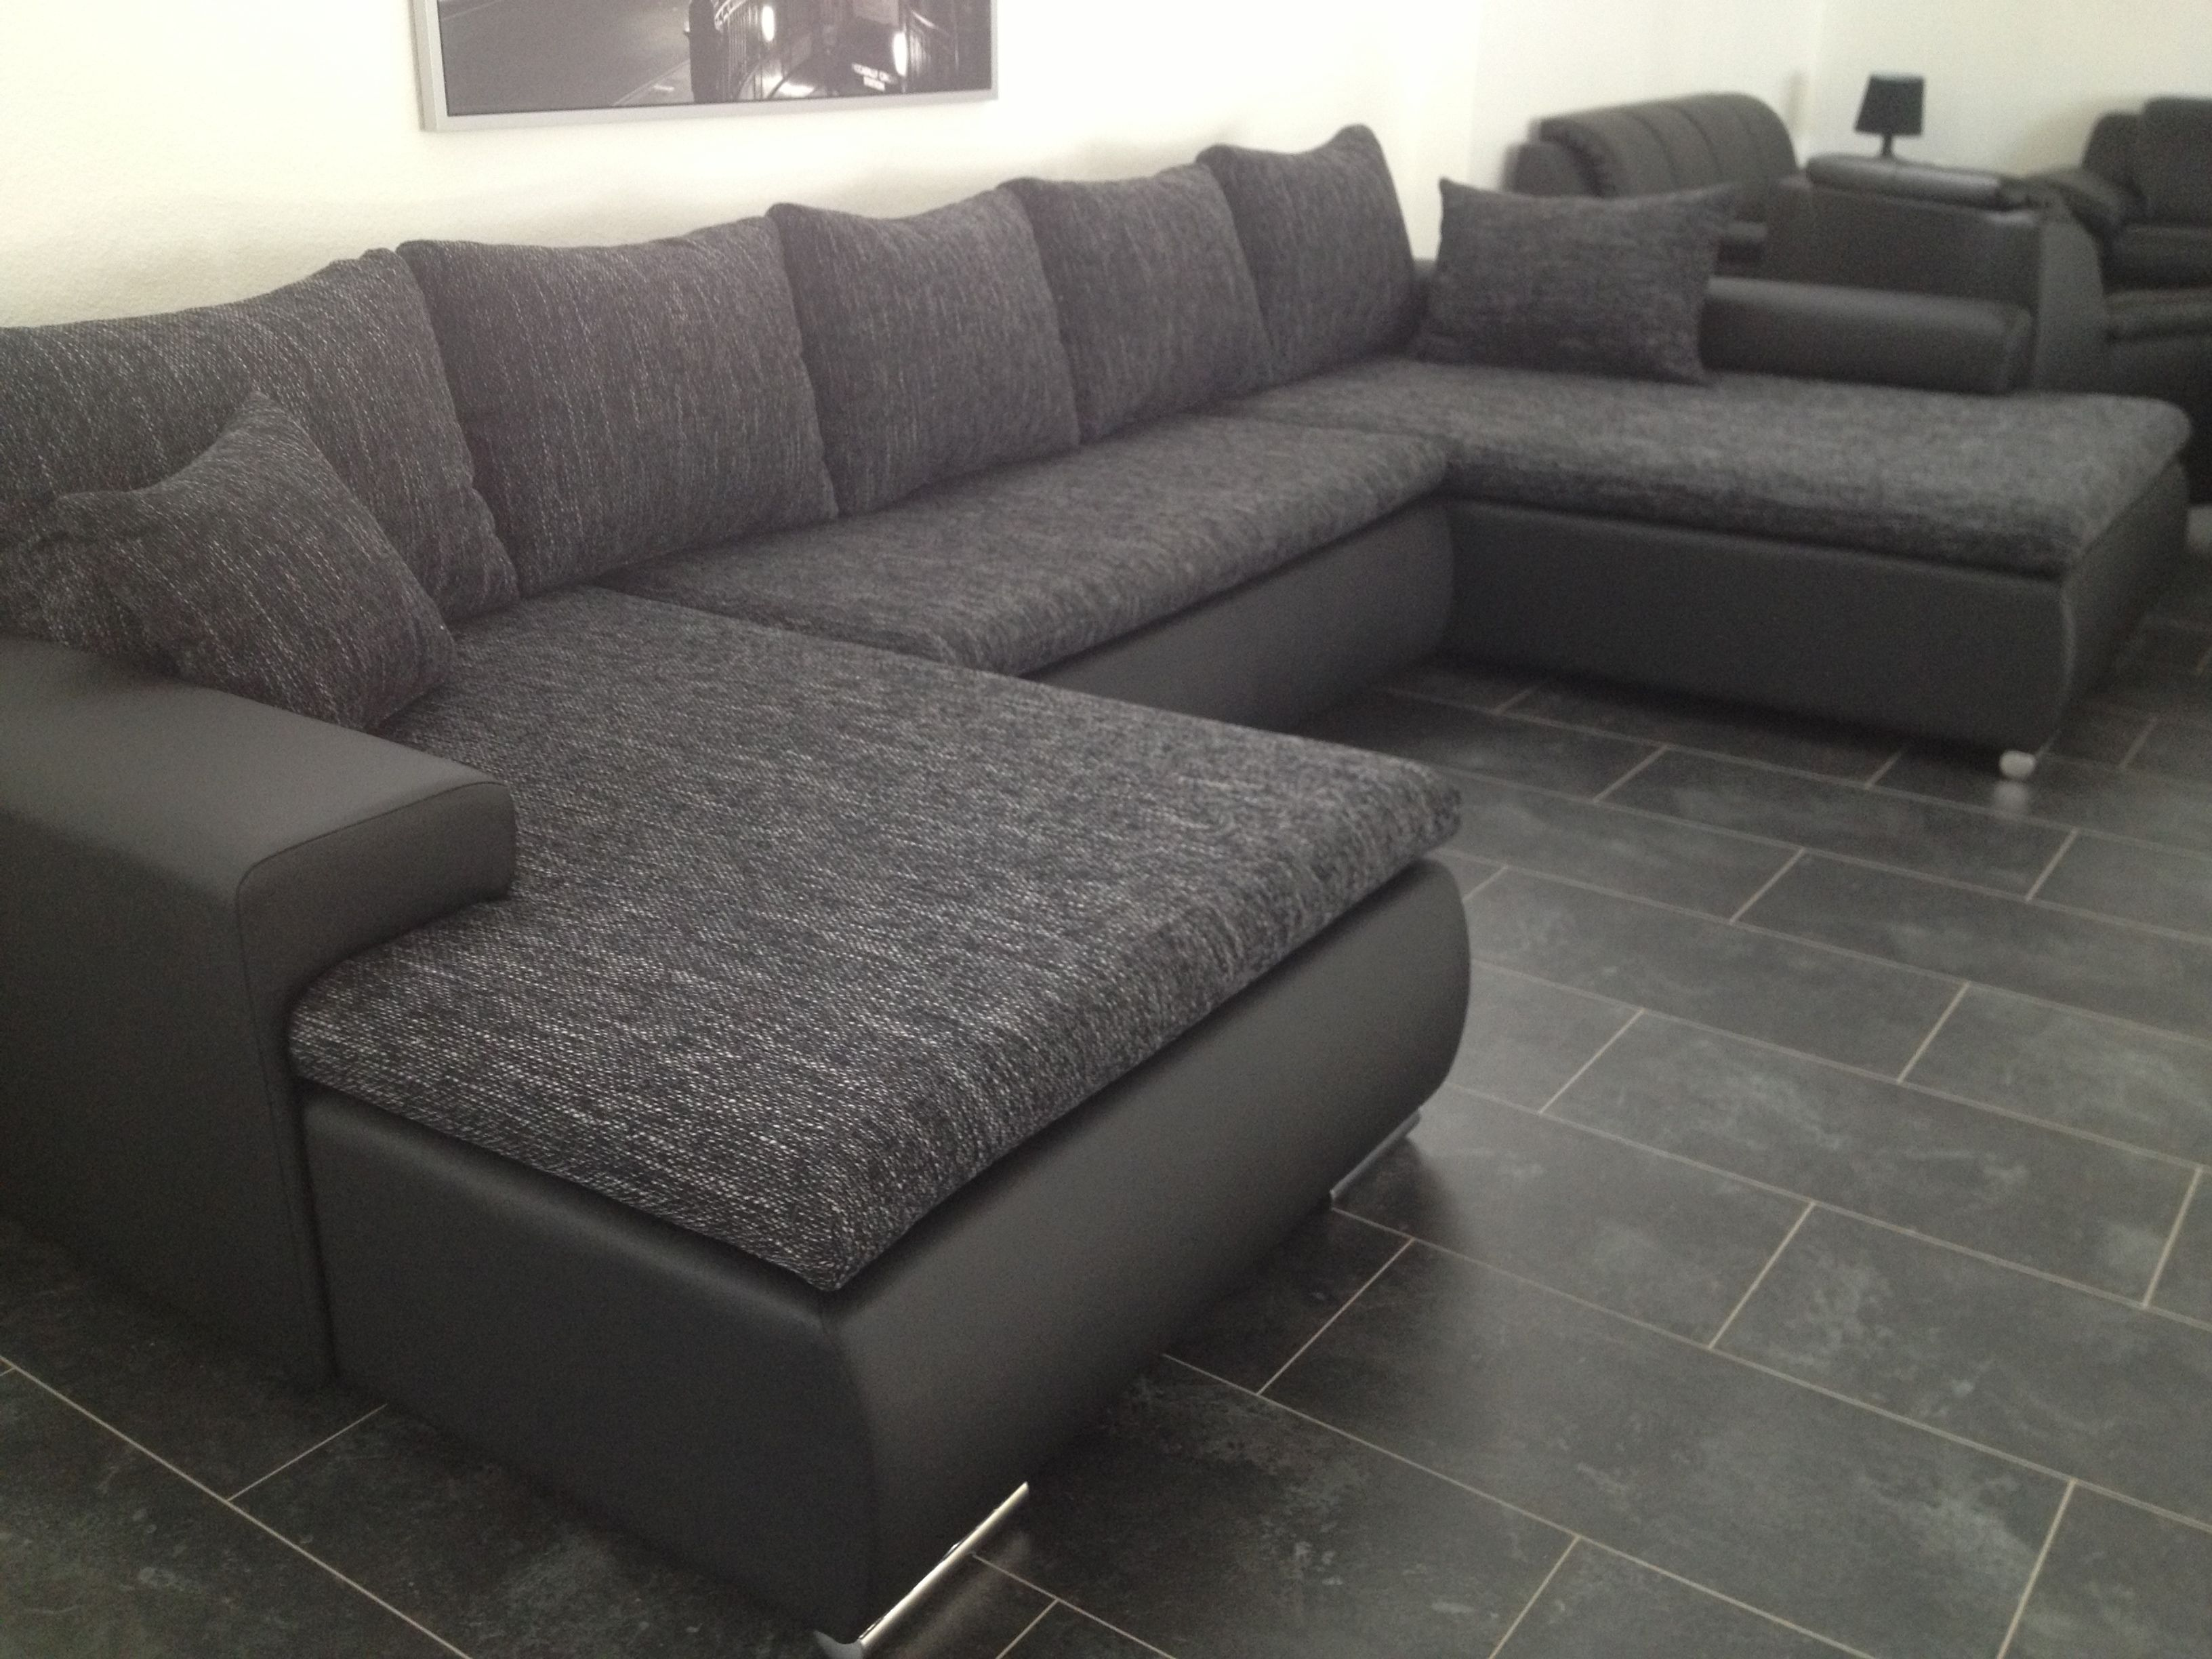 sofa lagerverkauf fabrikverkauf elkenroth polsterm bel wohnlandschaften trendsofas sofas. Black Bedroom Furniture Sets. Home Design Ideas